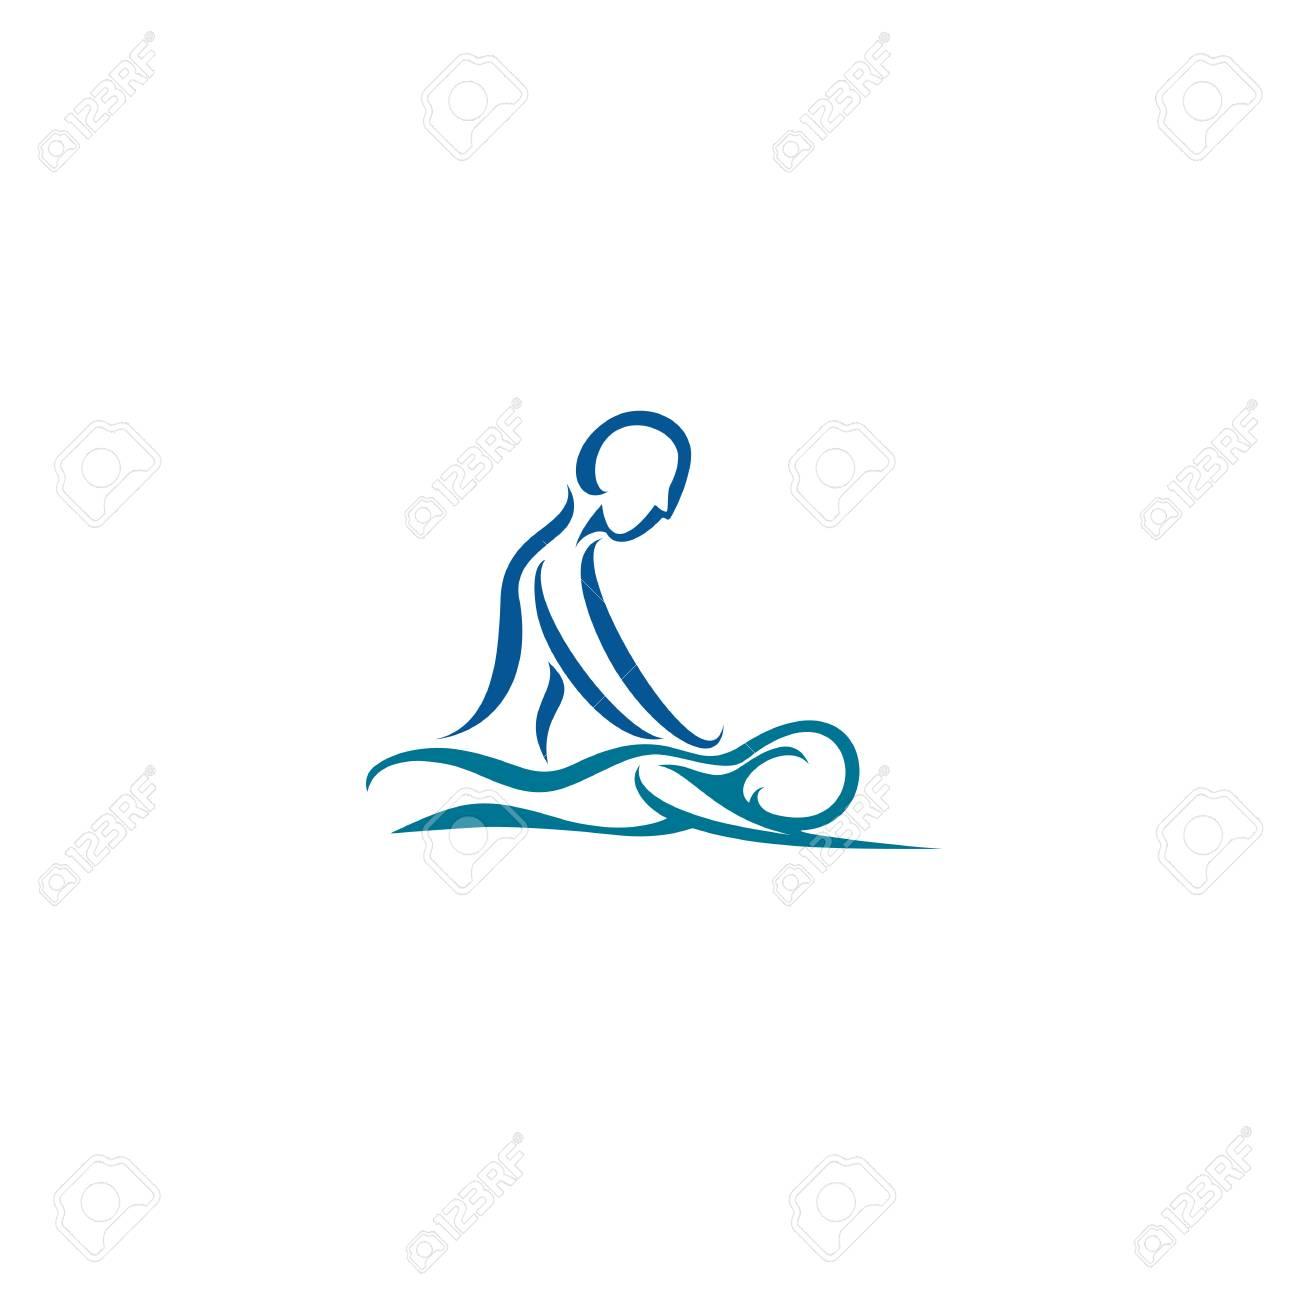 Creative spa center vector illustration. - 94819313